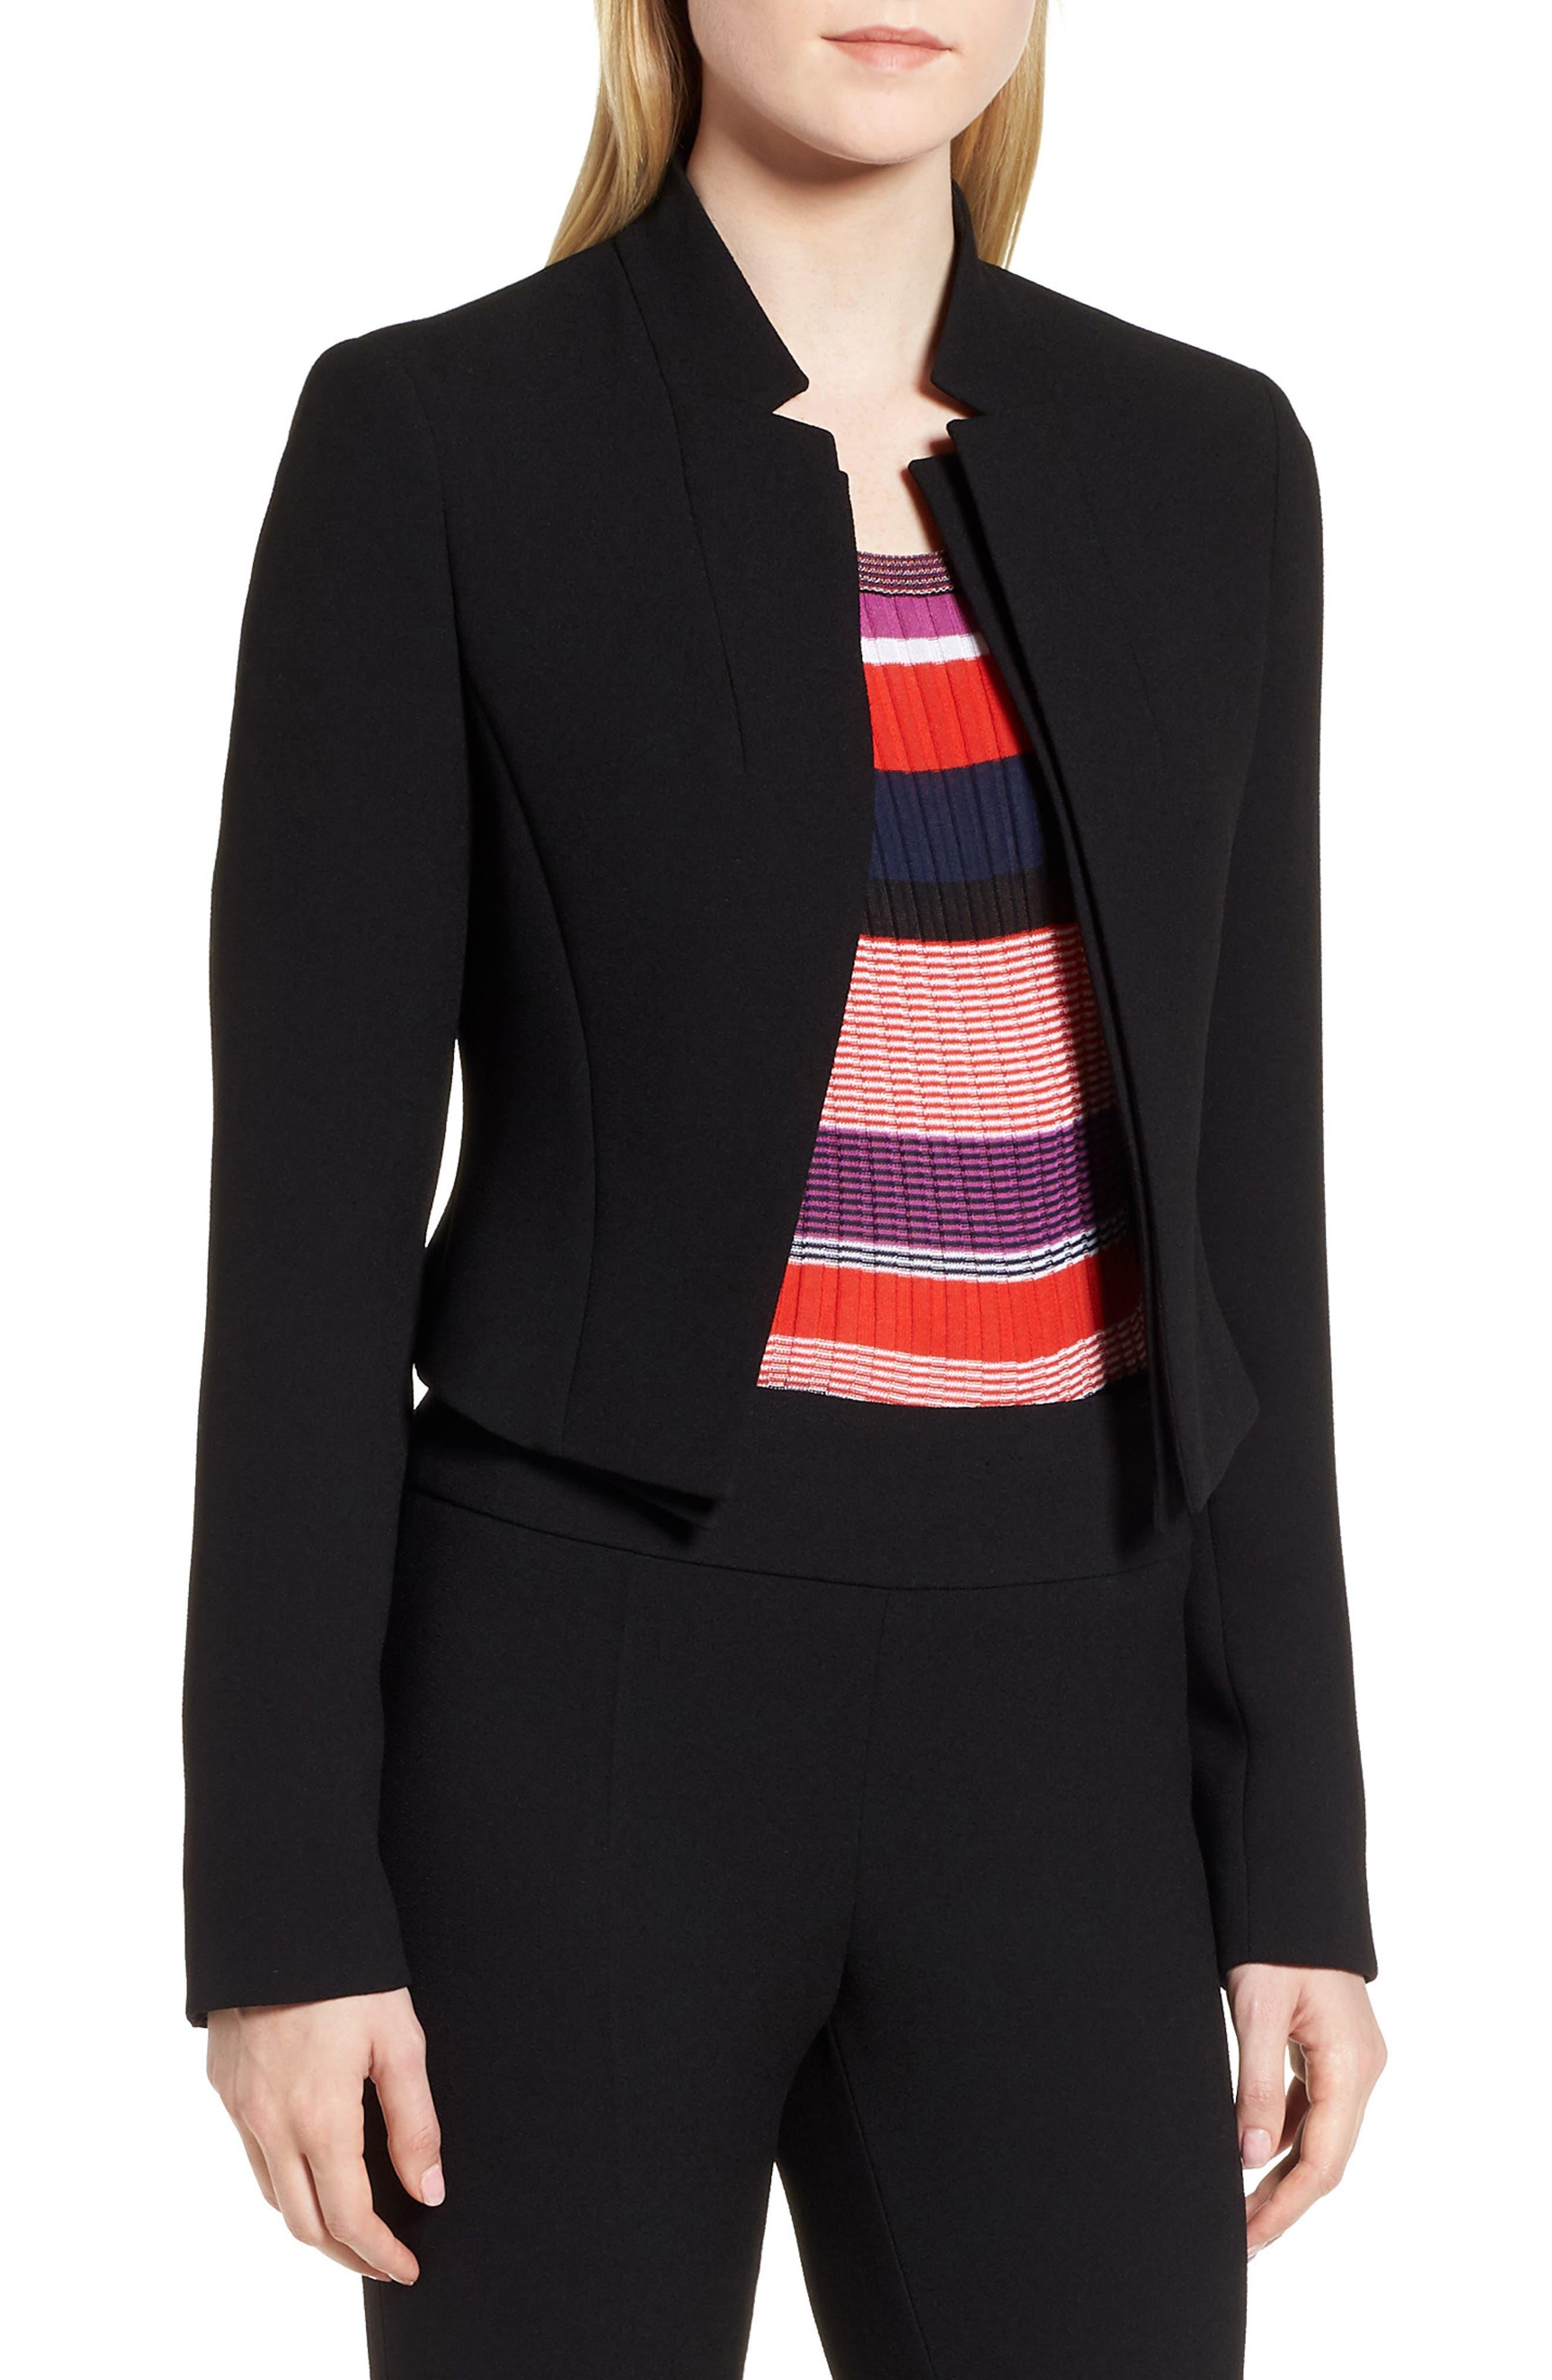 Jisala Compact Crepe Crop Jacket,                         Main,                         color, Black